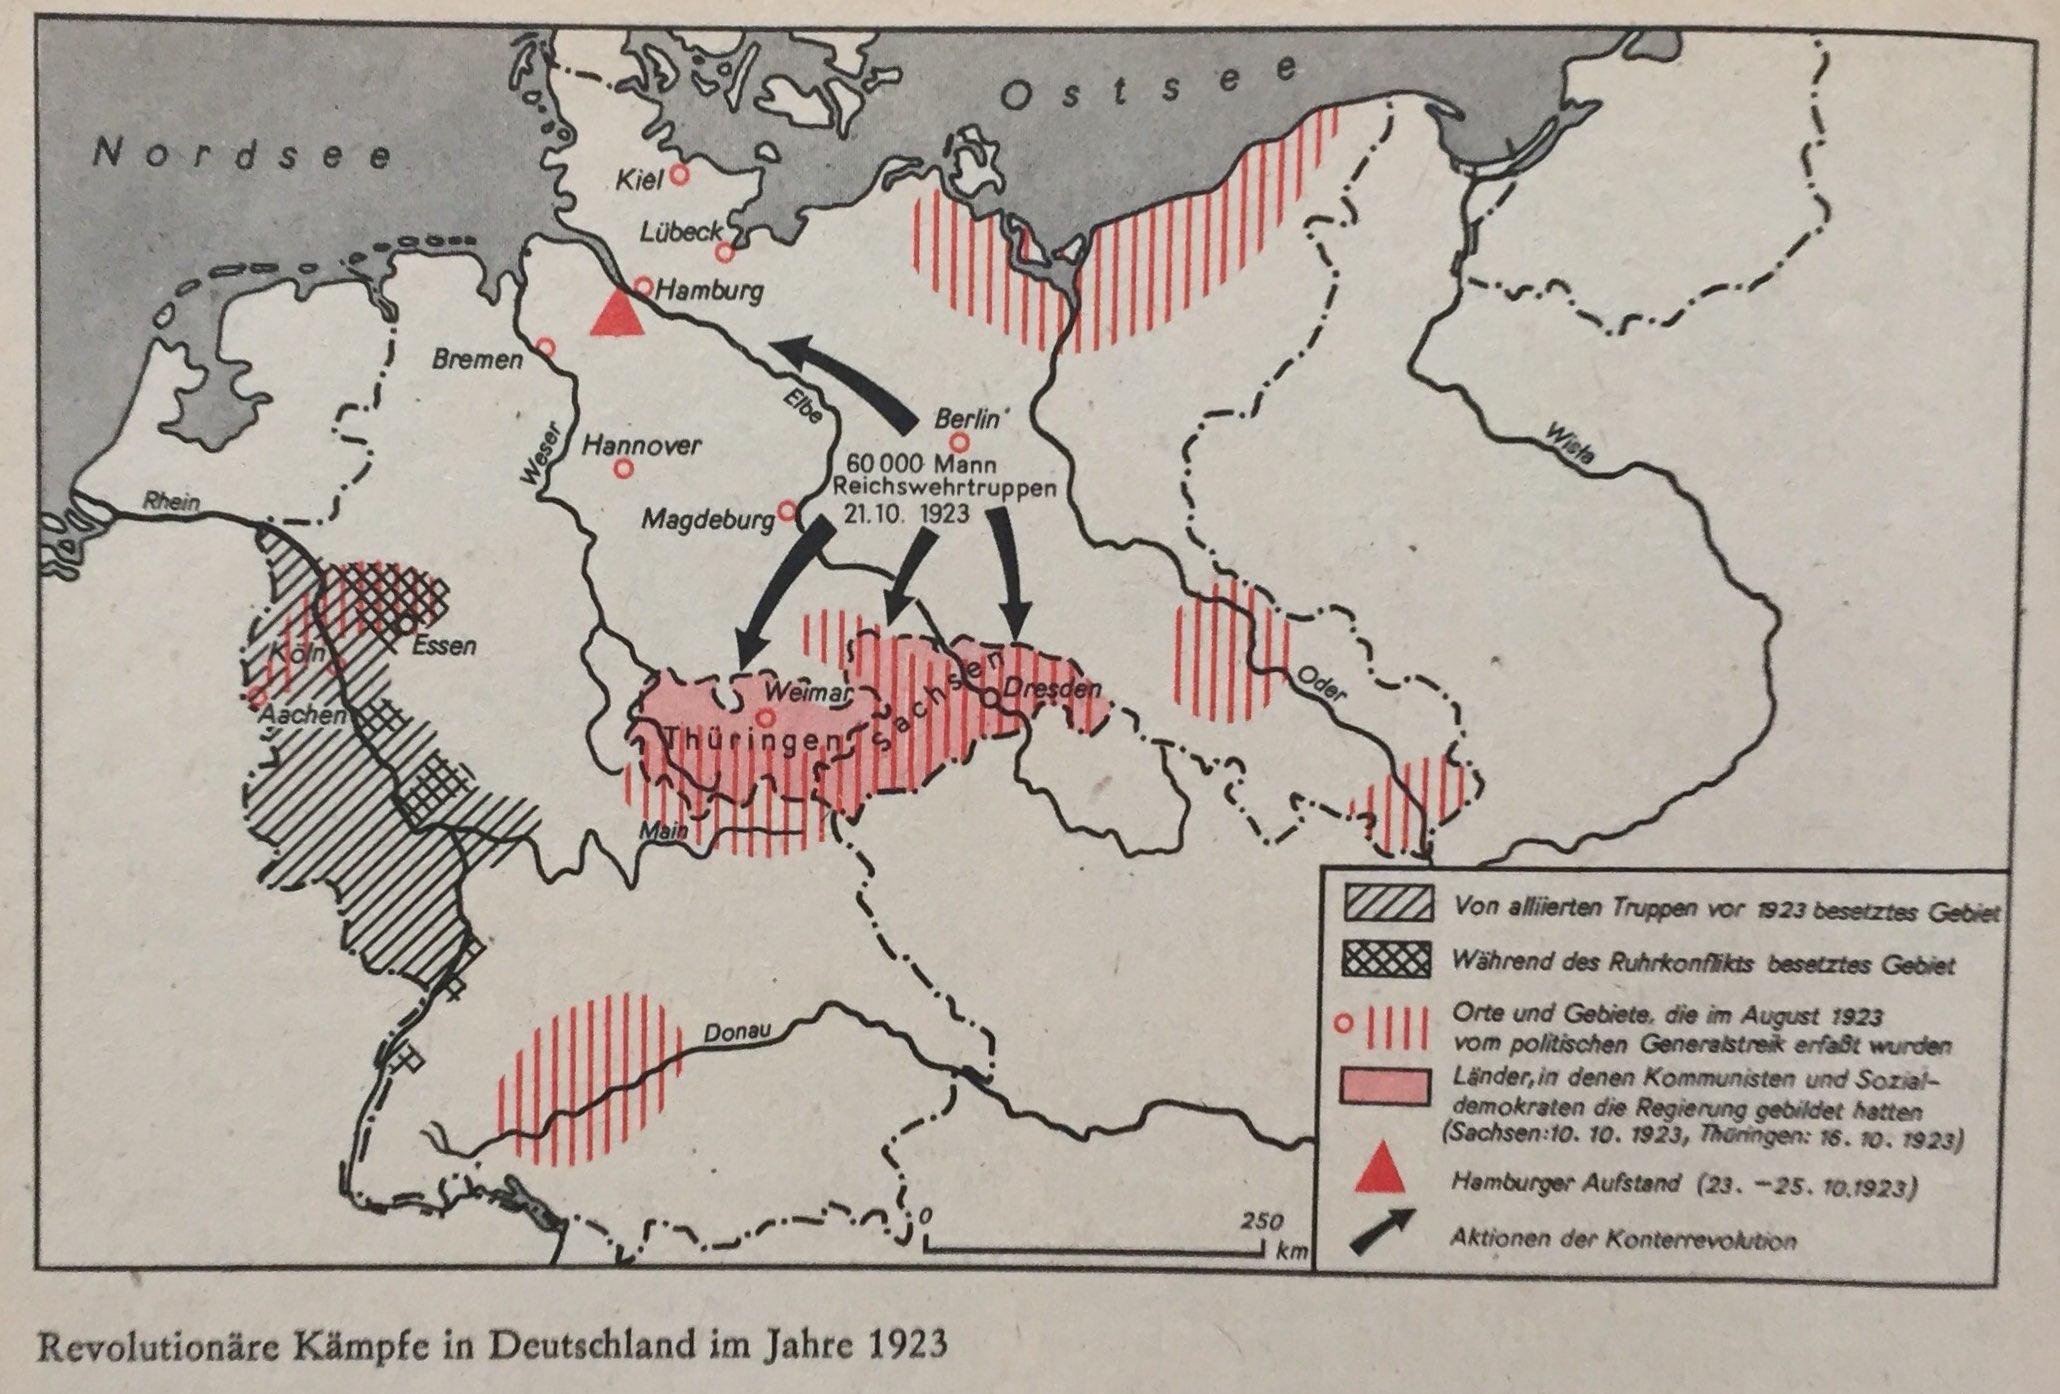 Revolutionäre Kämpfe Deutschland 1923